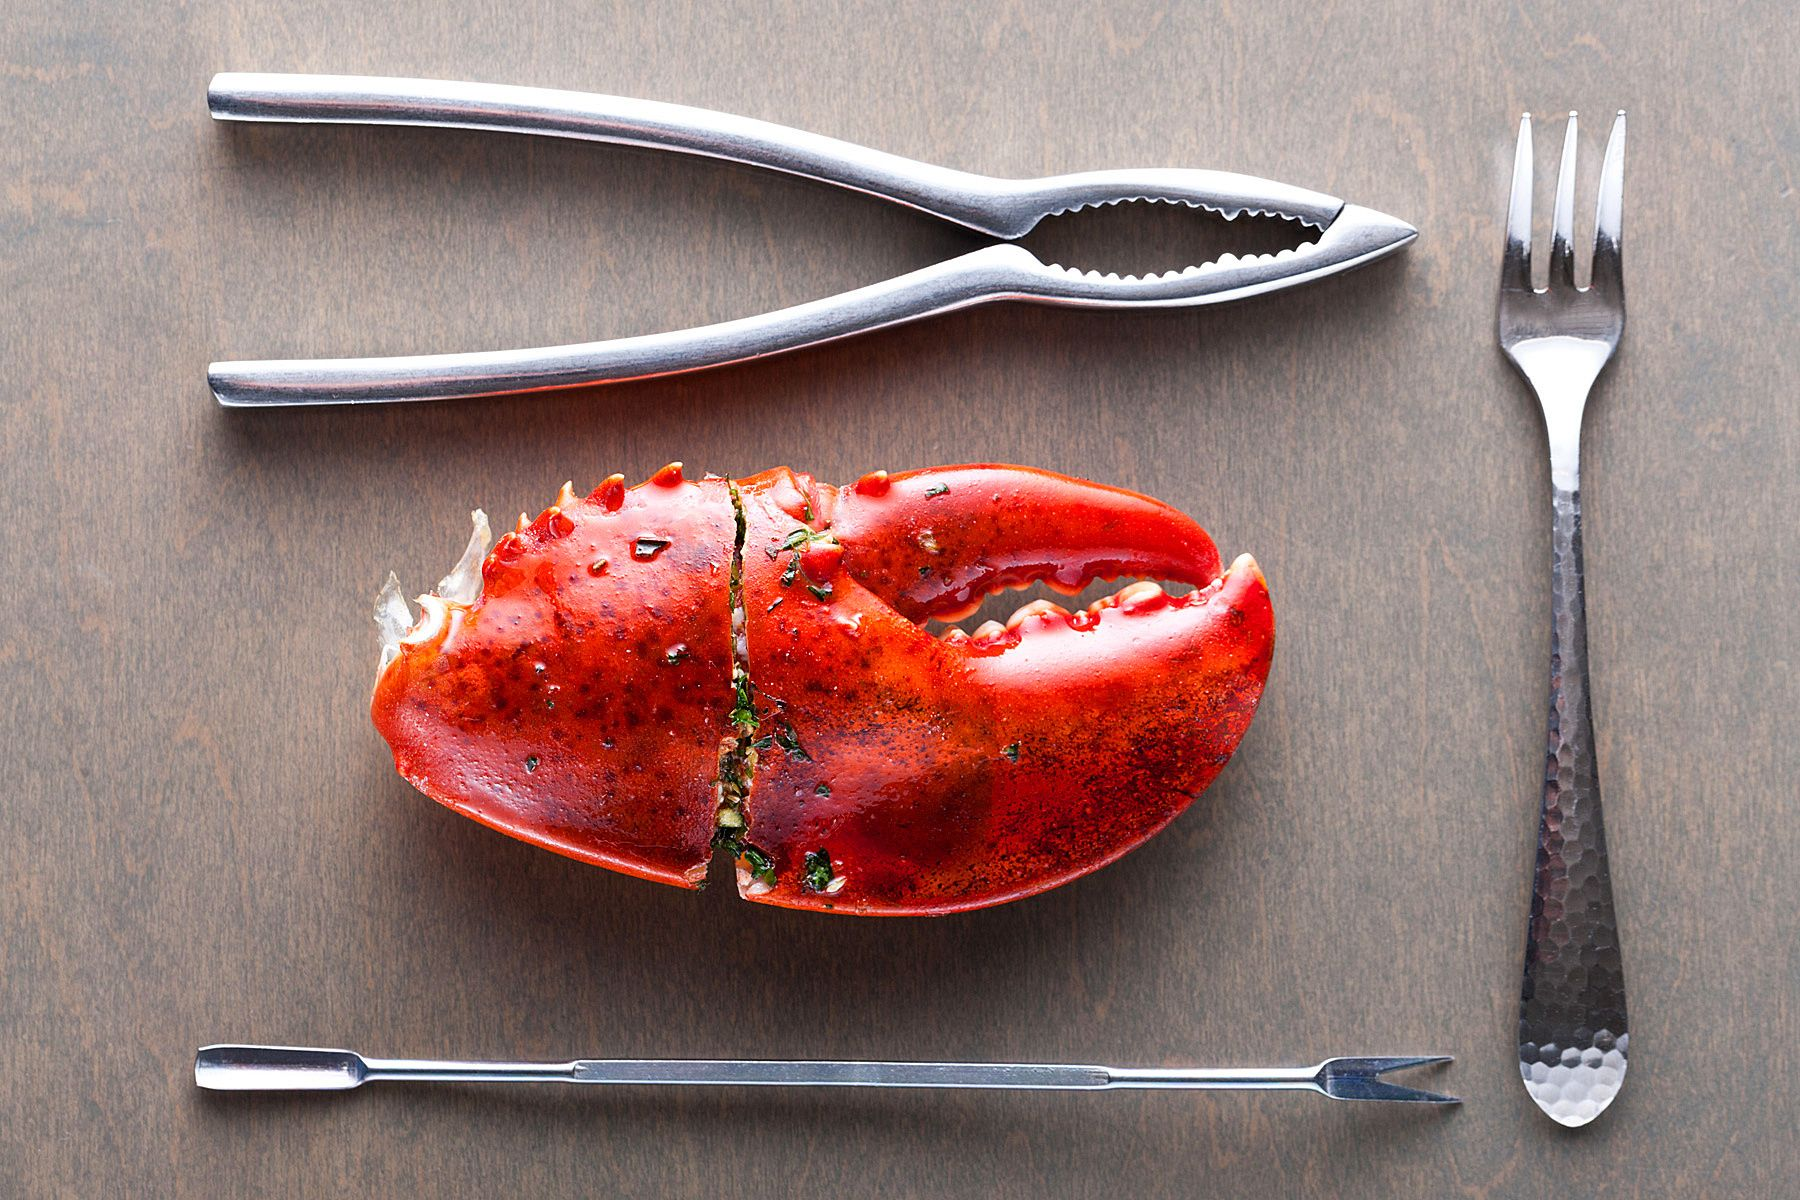 1brian_demello_photography_advertising_product_food_liquids_beverage_portrait_beauty_0452_cc_014_copy-10ea22207f97e97a484b0667cbedccf7.jpg